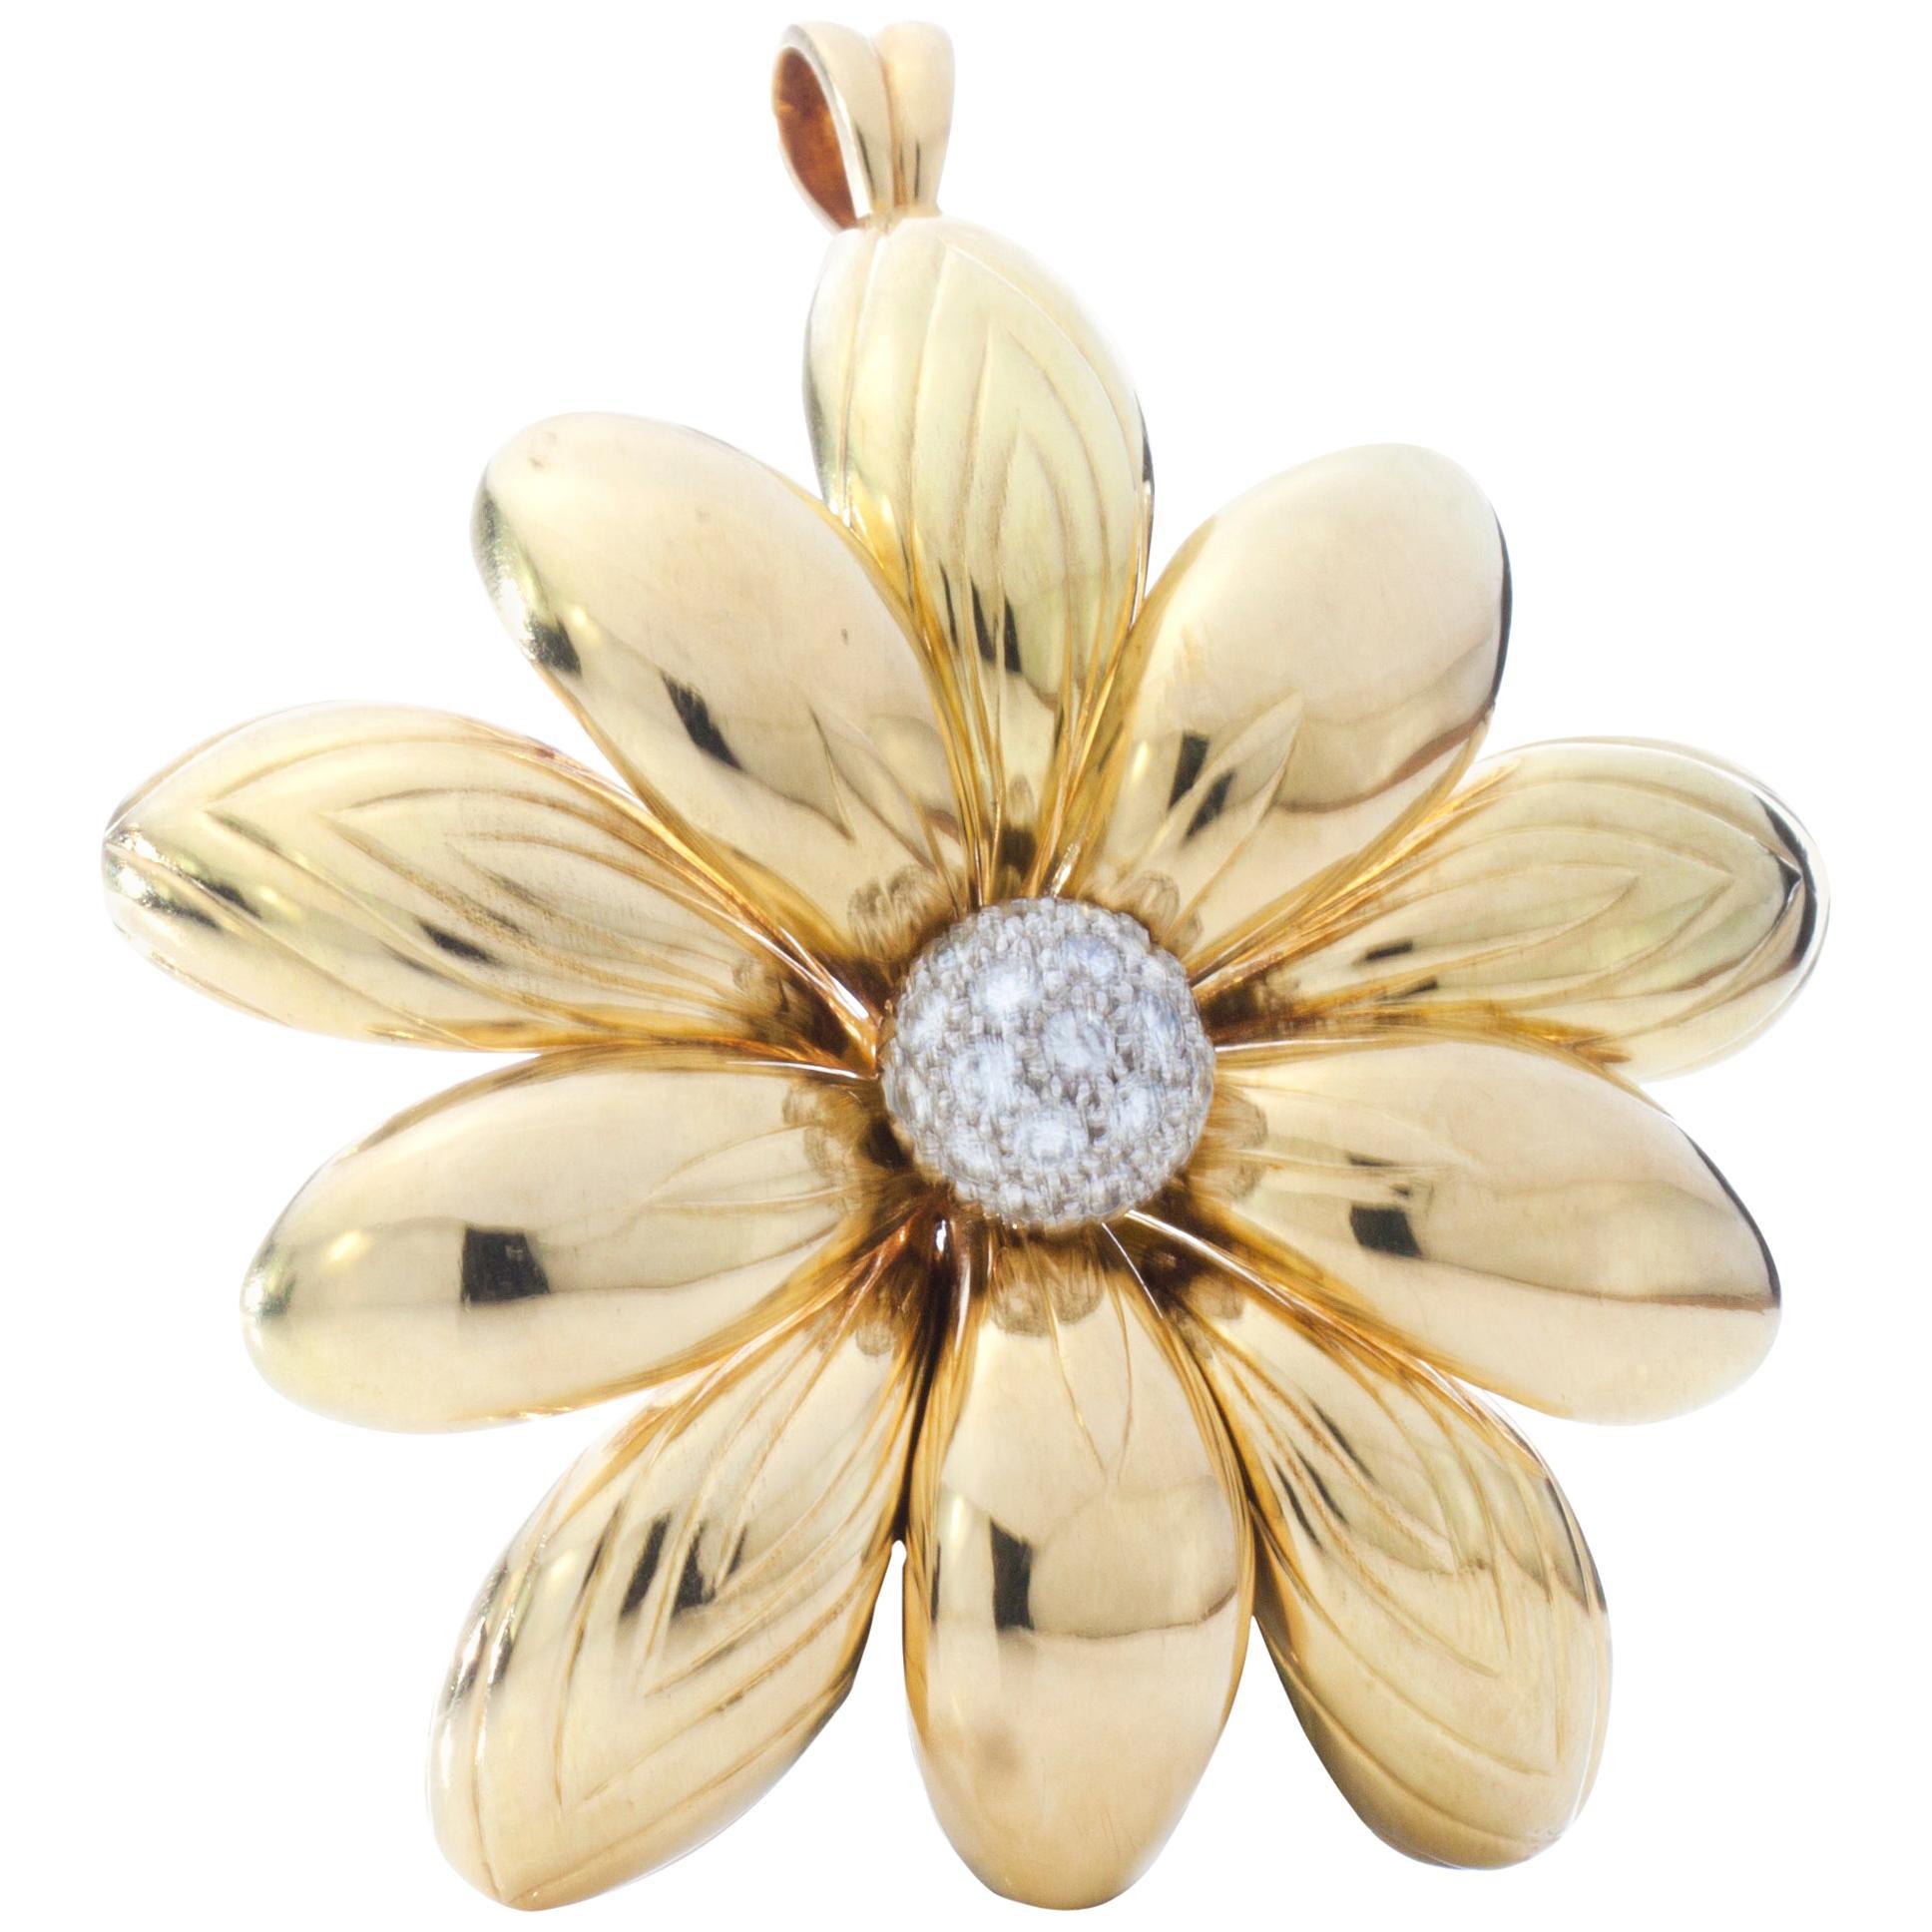 18 Karat Yellow Gold Ladies Flower Brooch and Pendant with Diamonds